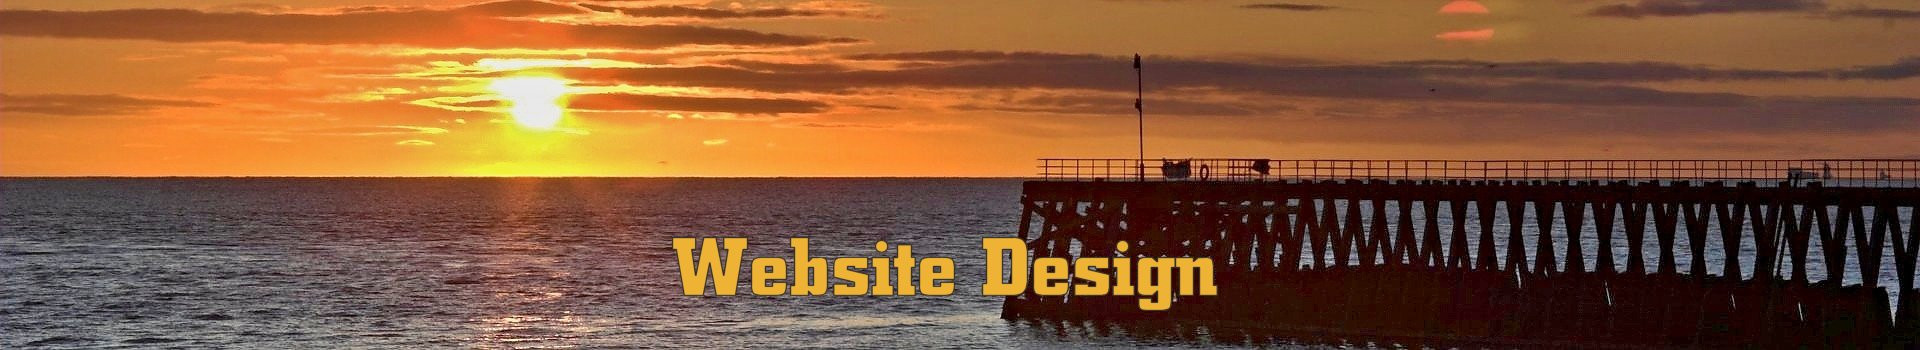 http://ljbweb.com/wp-content/uploads/2014/10/ljb-sunrise-web-design-1920x350.jpg